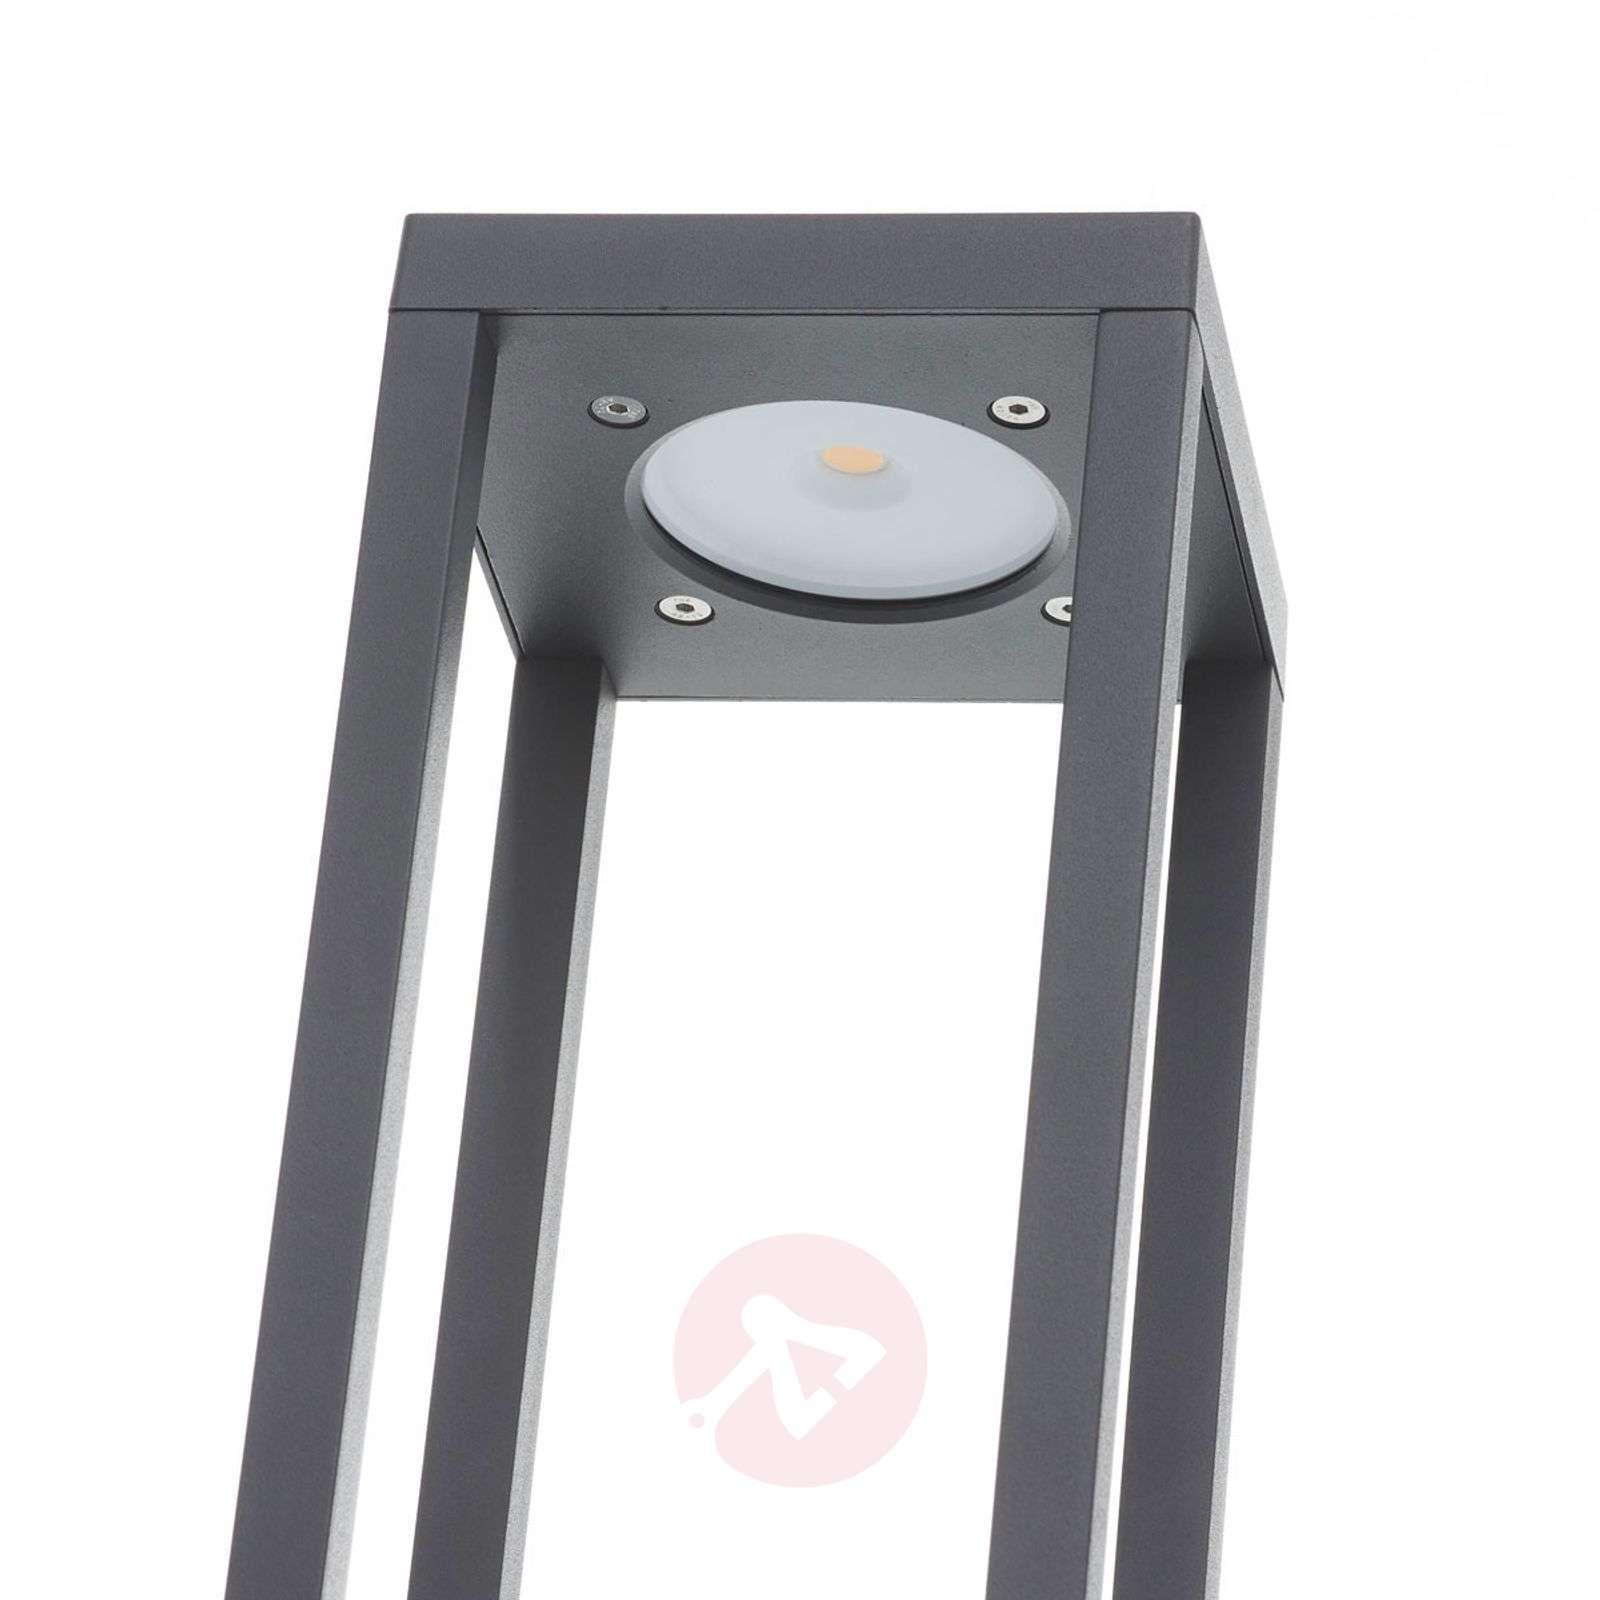 LED-pollarivalaisin Carlota, tummanharmaa, 50 cm-9616149-02